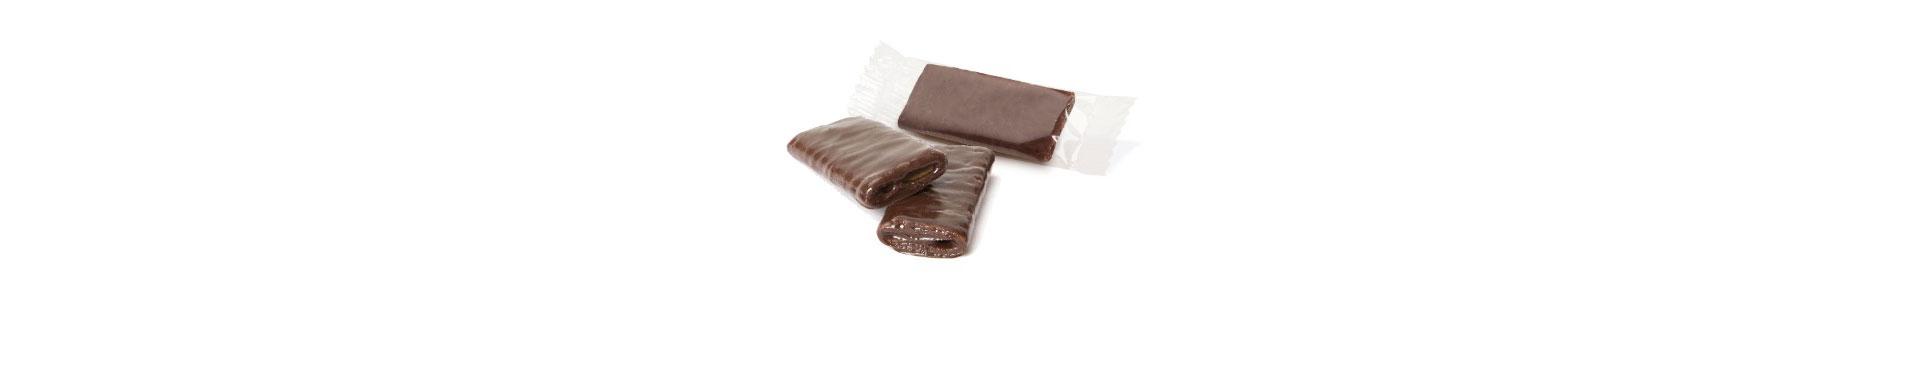 Creps cacao destacada